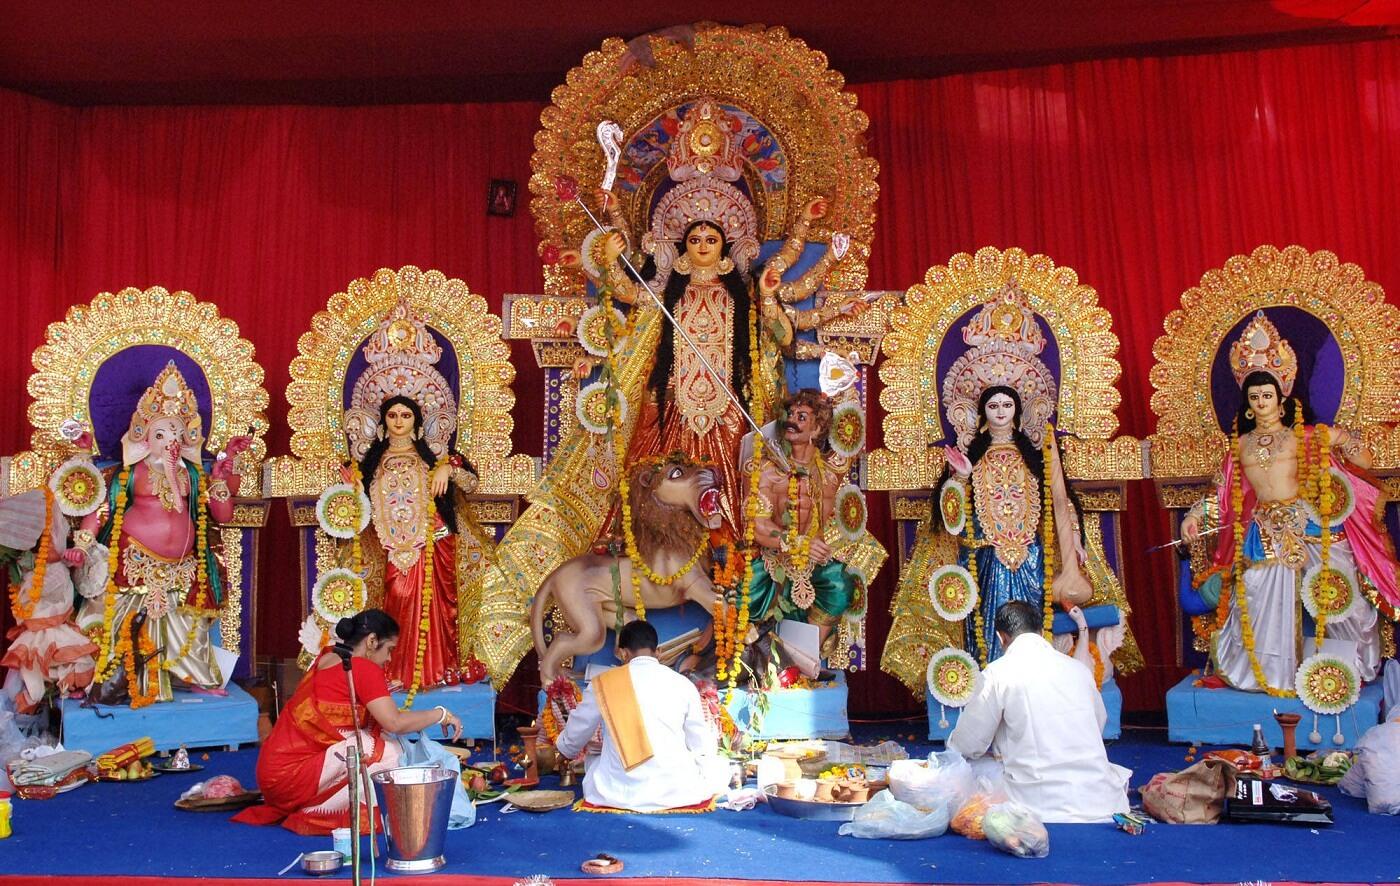 famous festivals in India